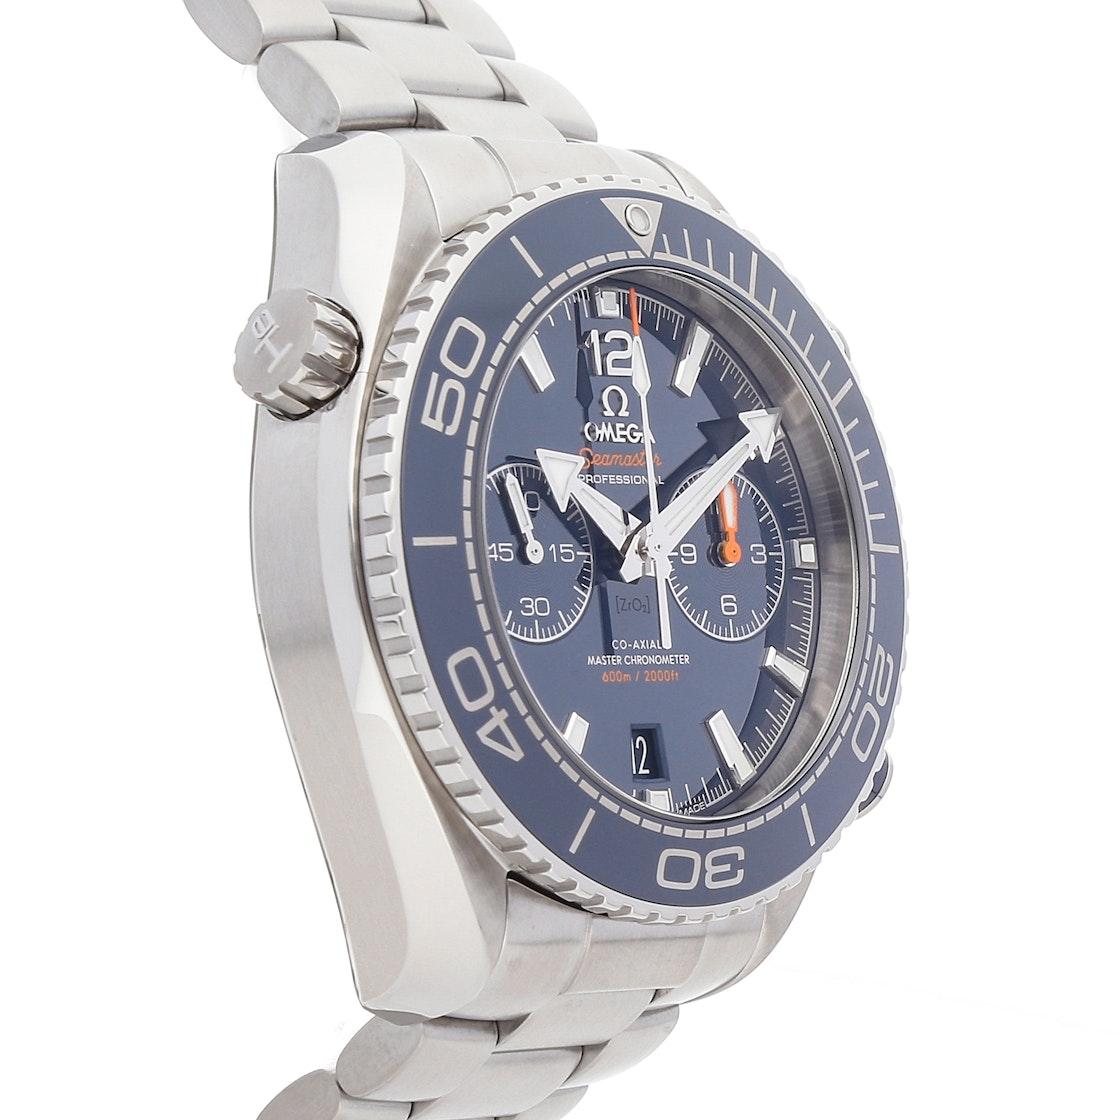 Omega Seamaster Planet Ocean 600m Chronograph 215.30.46.51.03.001